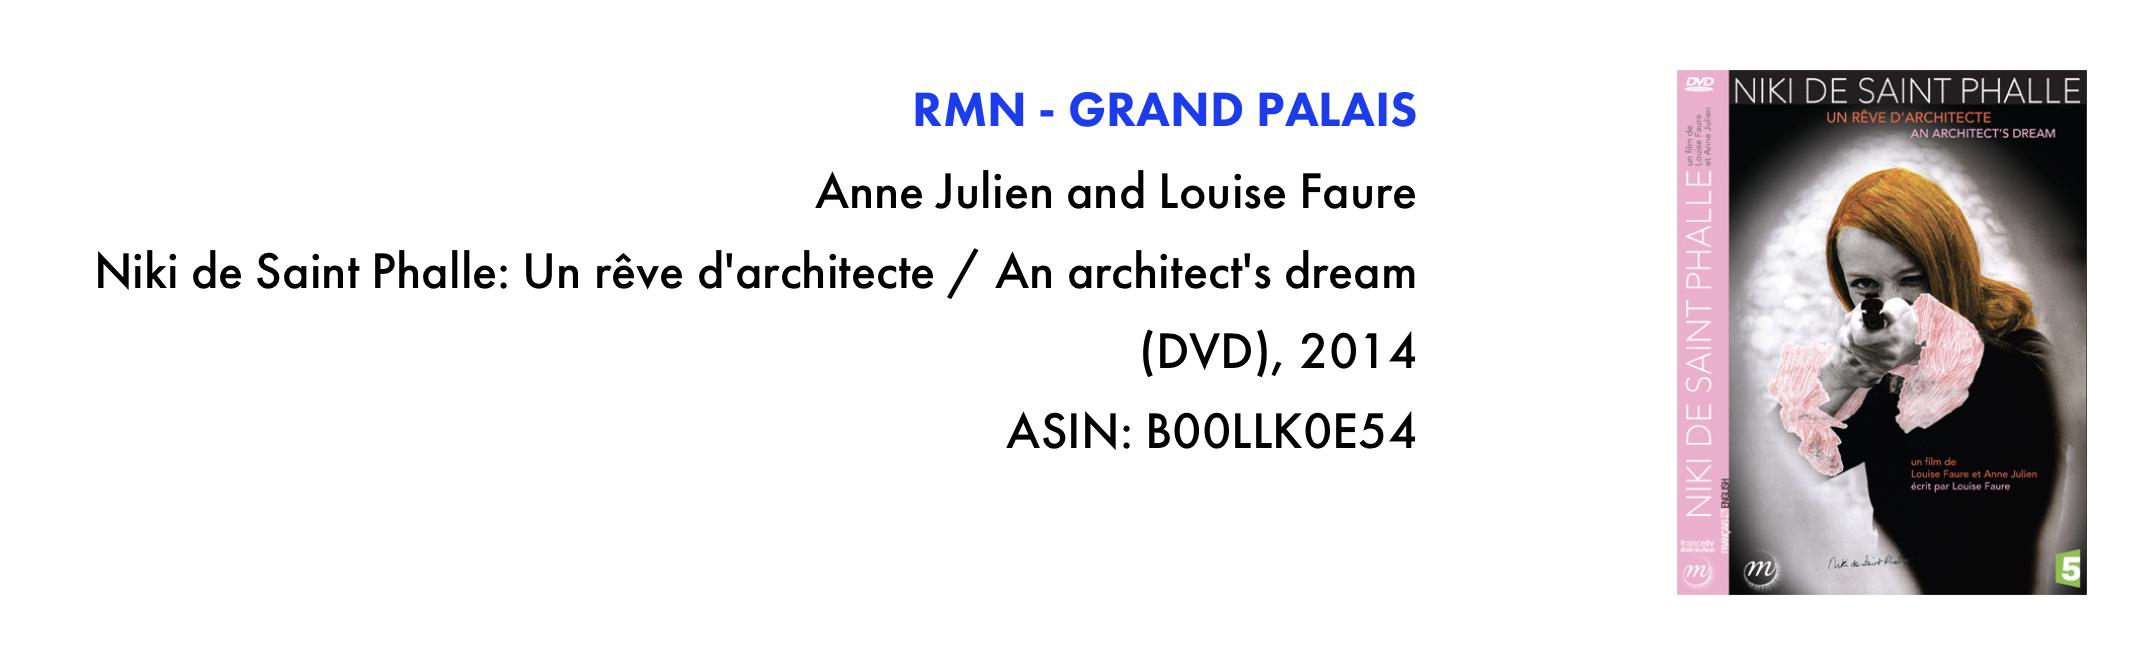 RMN Grand Palais. DVD titled Niki de Saint Phalle: An Architect's dream from 2014. ASIN number for purchase: B00LLK054